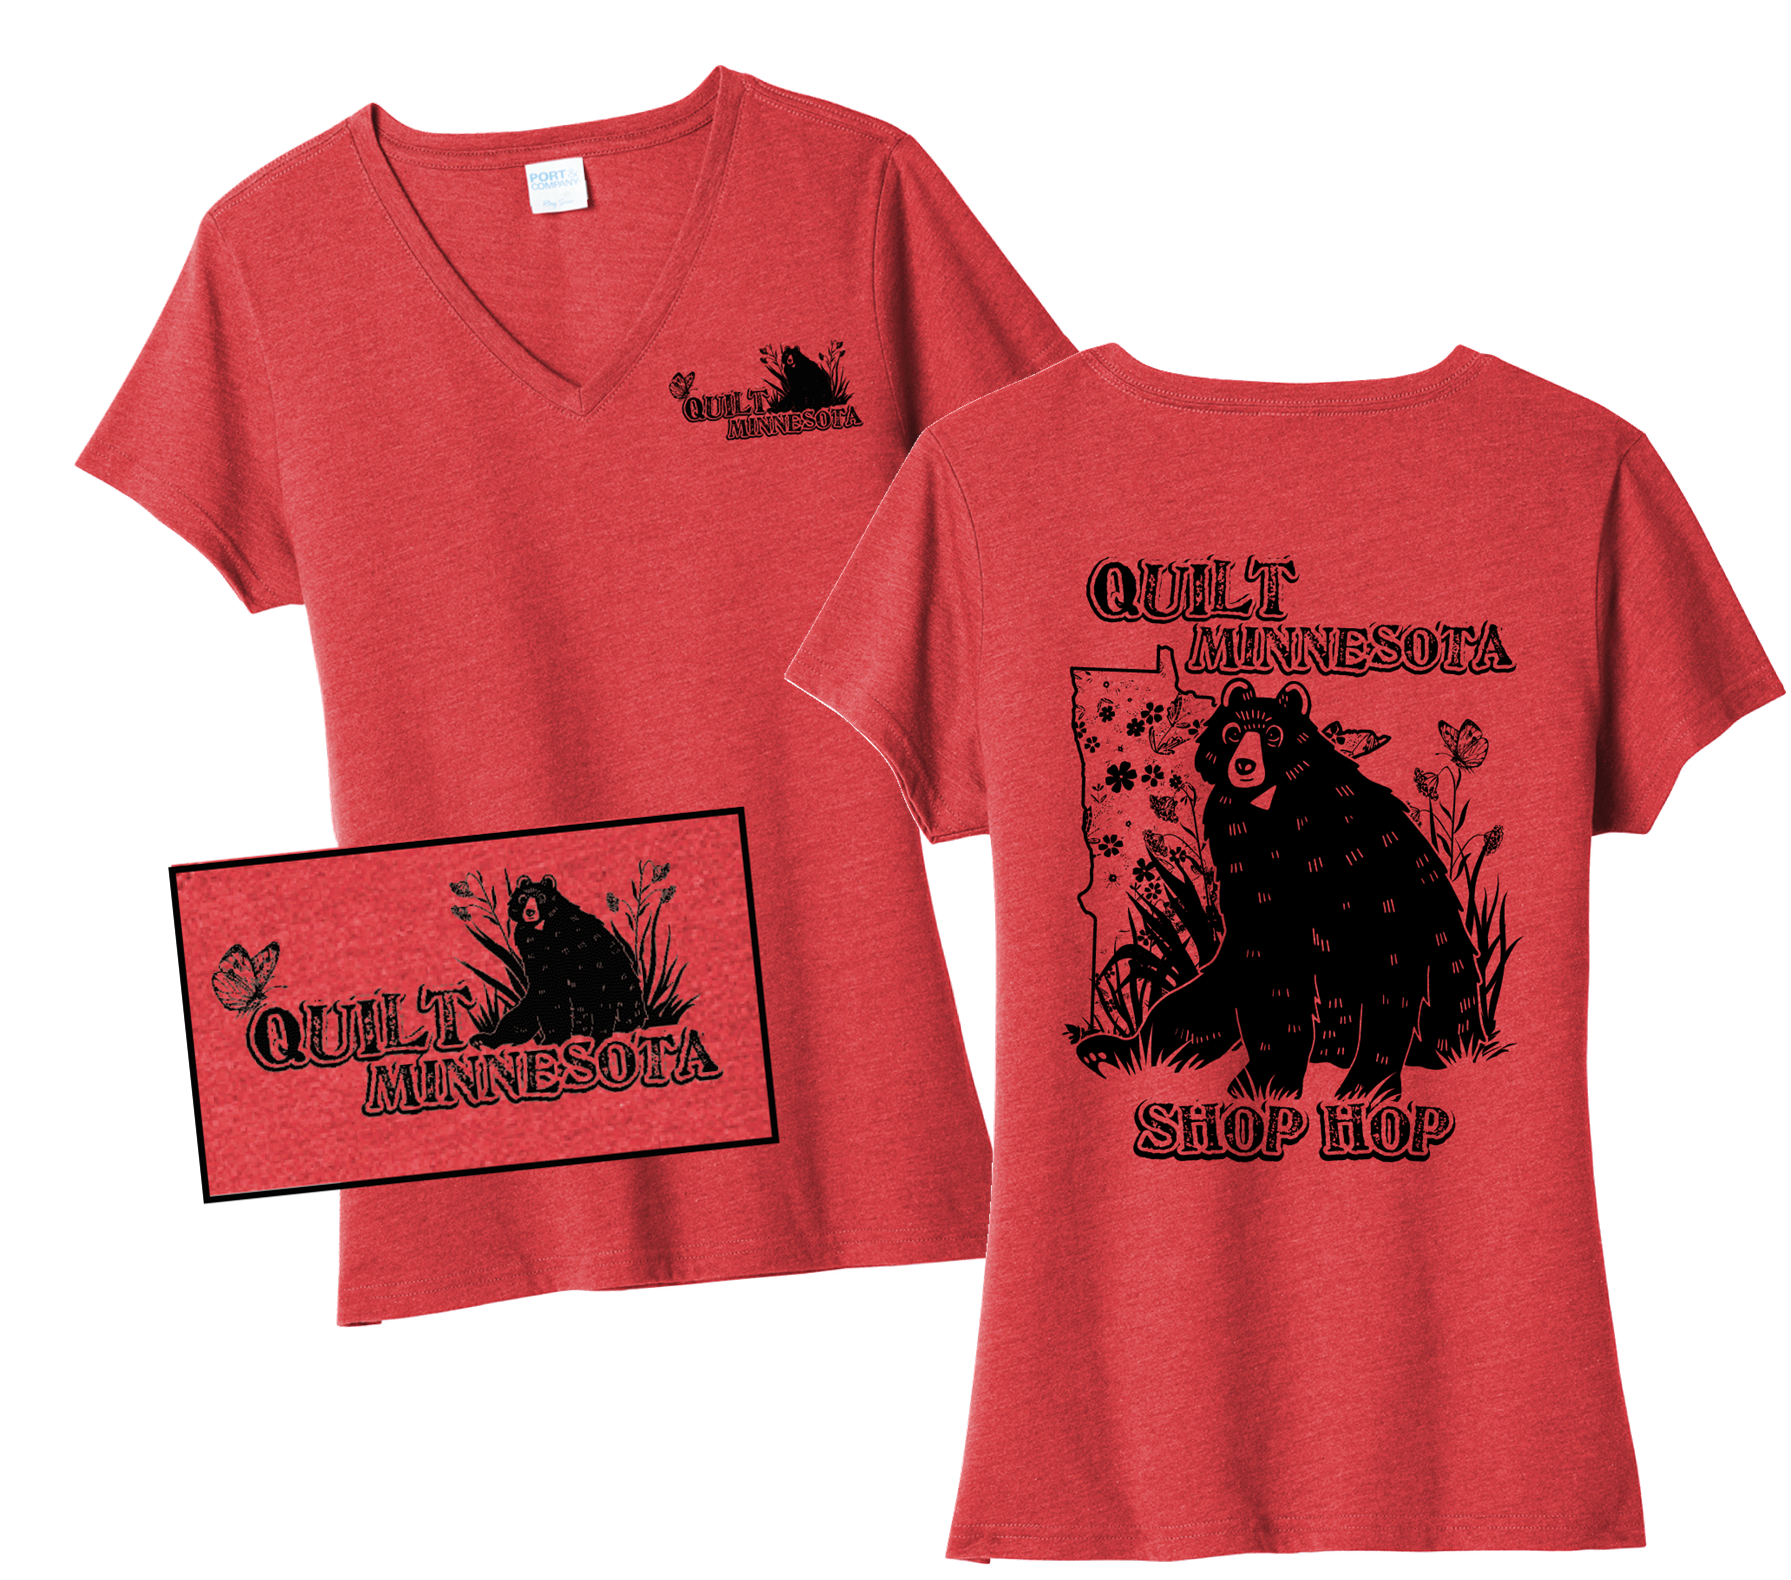 Quilt Minnesota T-shirts 2020